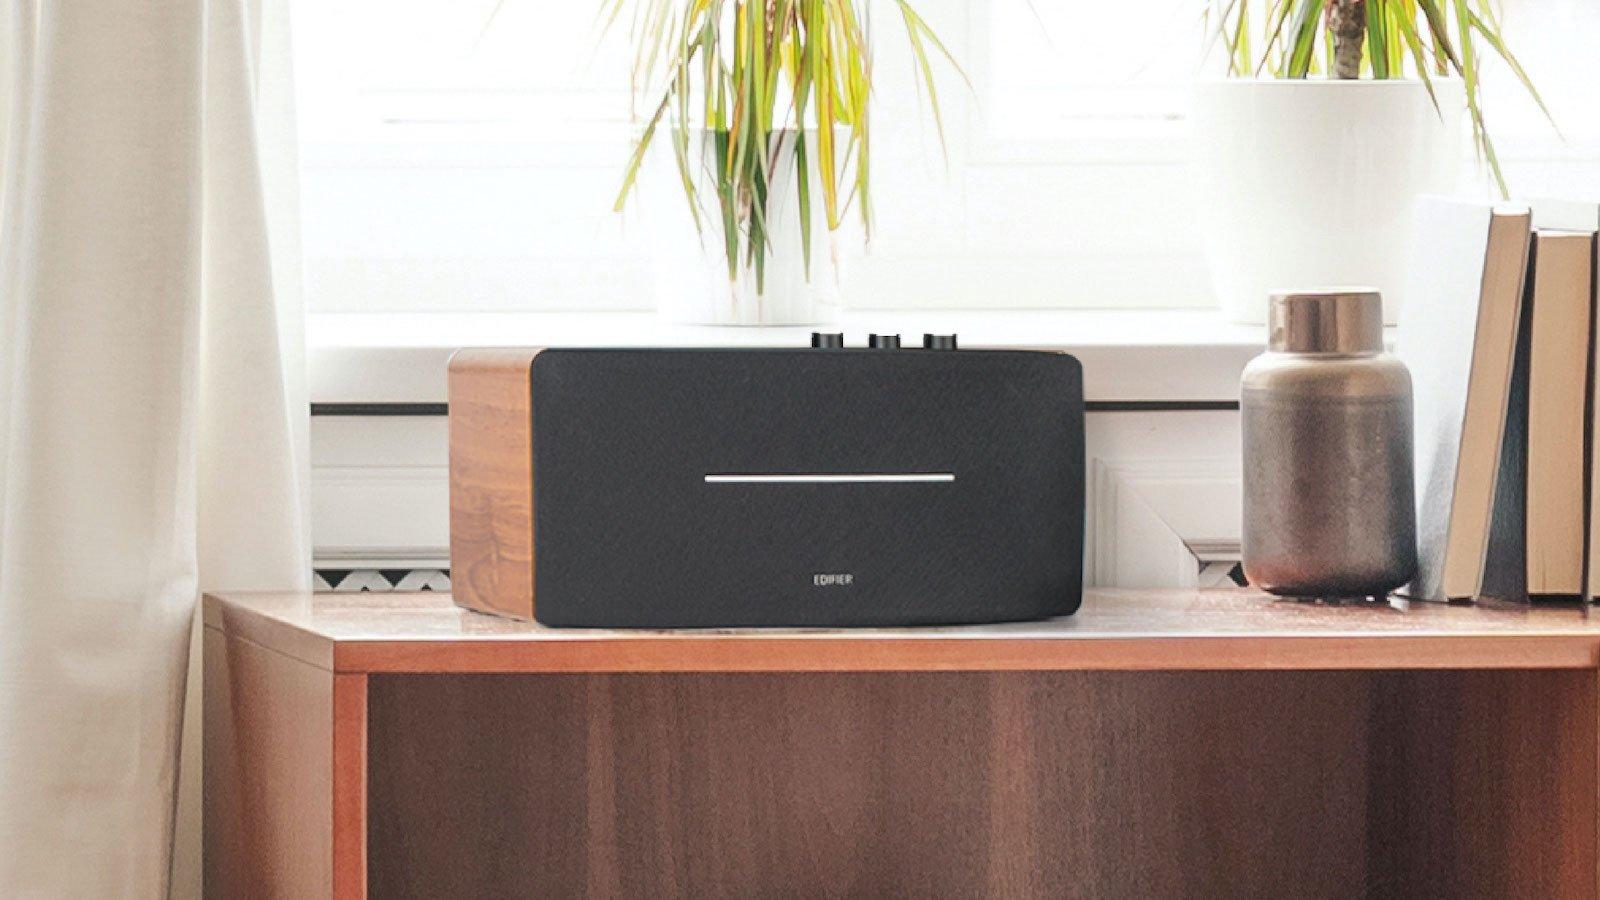 Edifier D12 desktop stereo speaker has versatile connectivity and top-notch sound